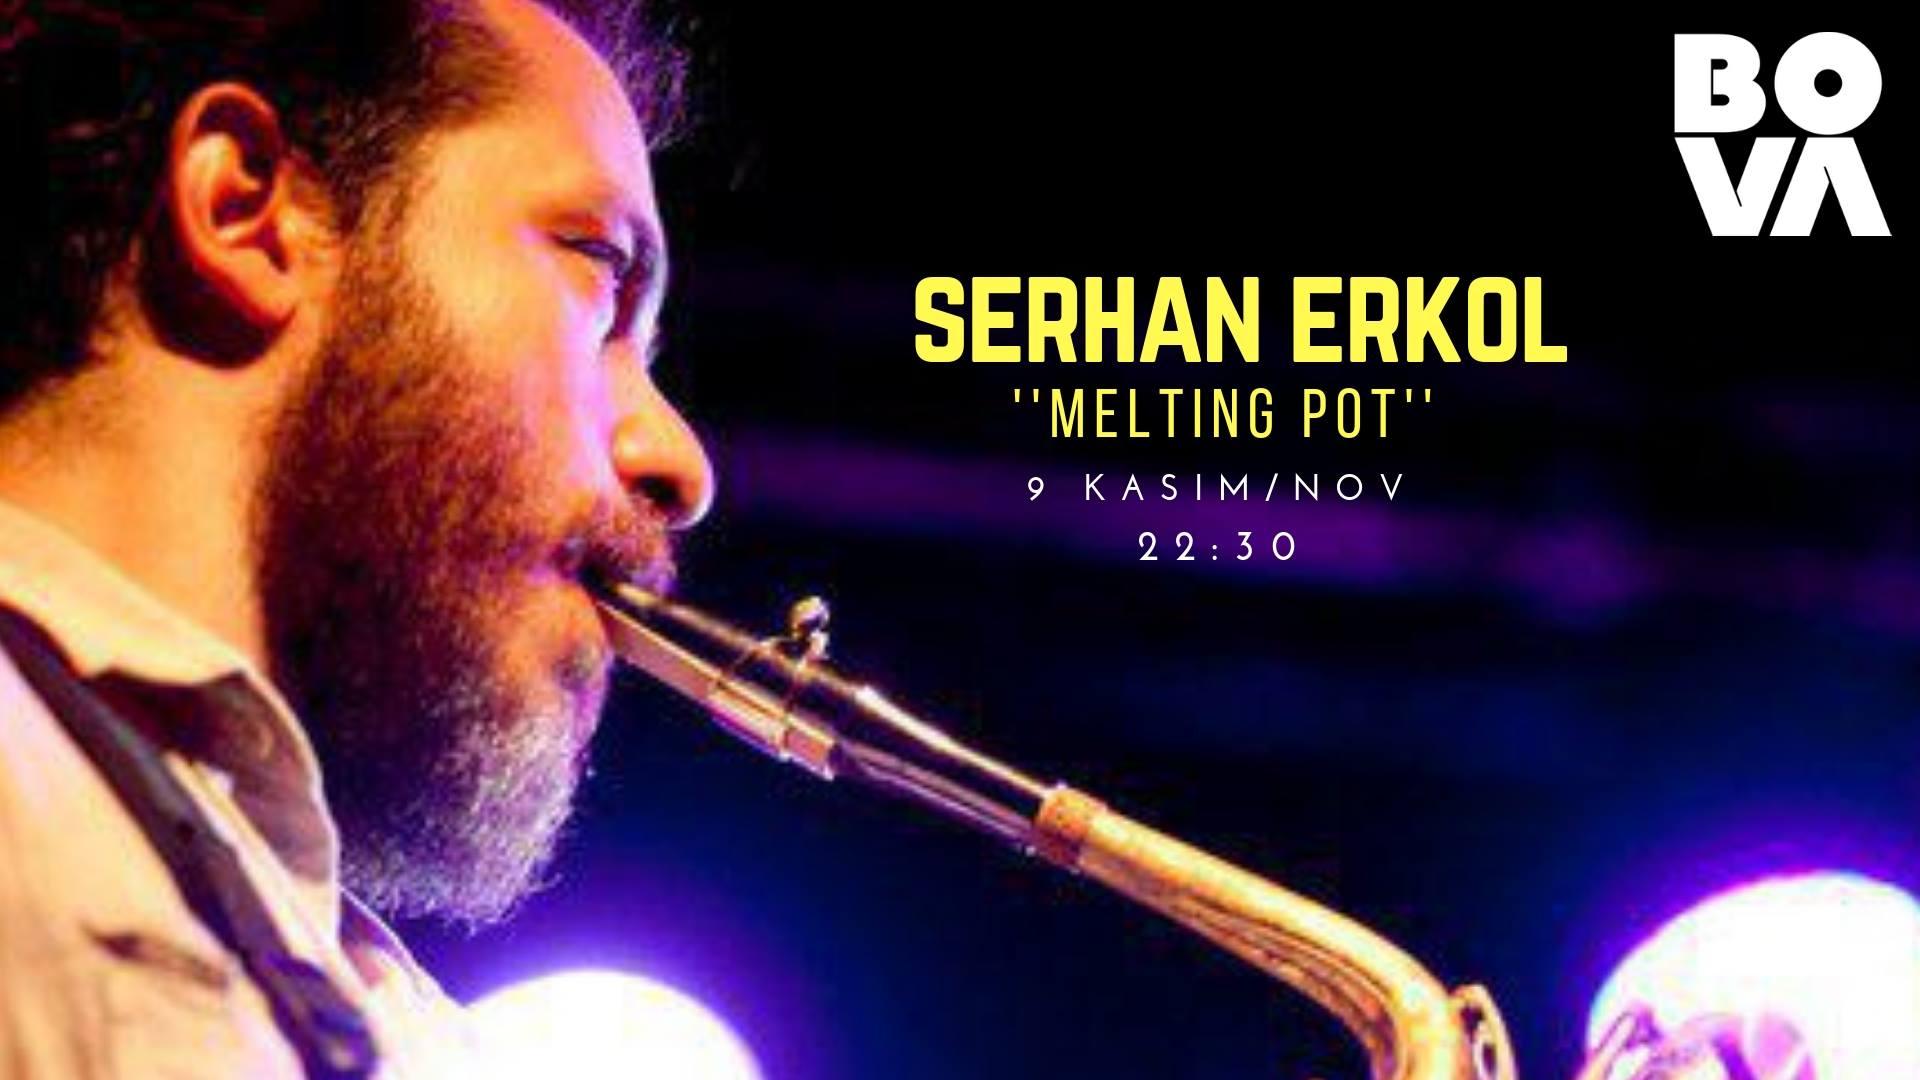 Serhan Erkol Melting Pot